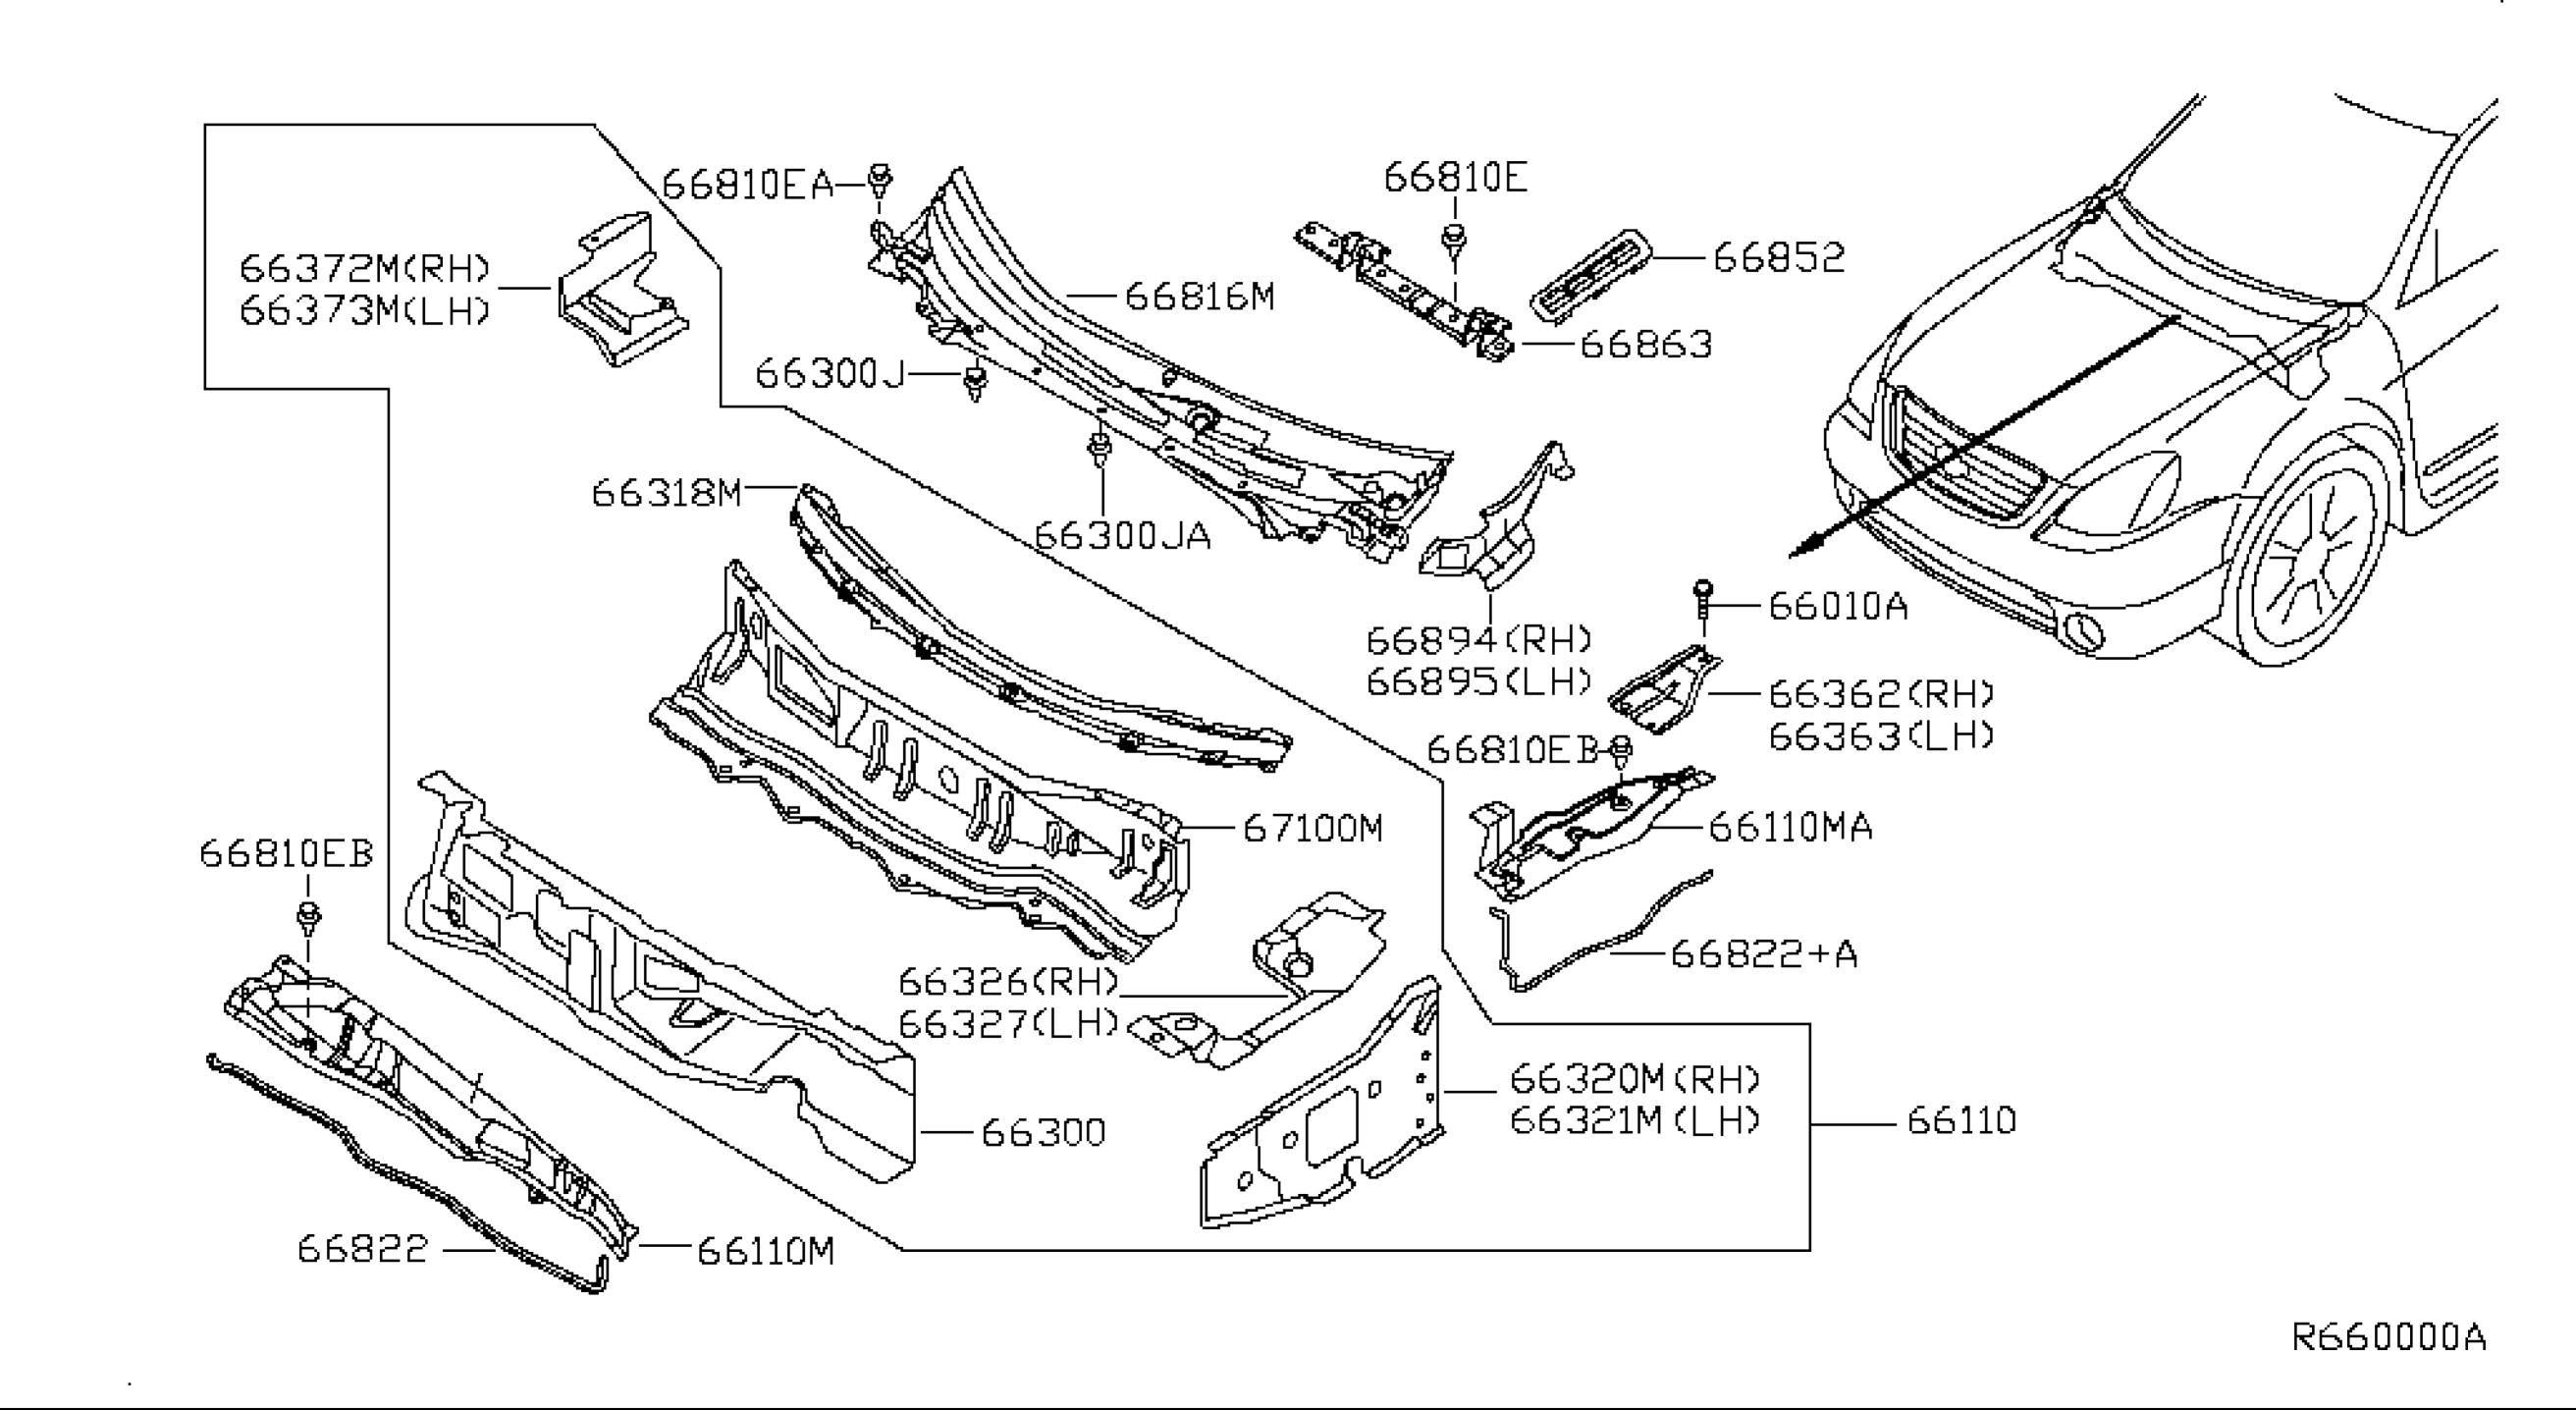 Nissan Altima 2 5 Engine Diagram Nissan Altima Parts